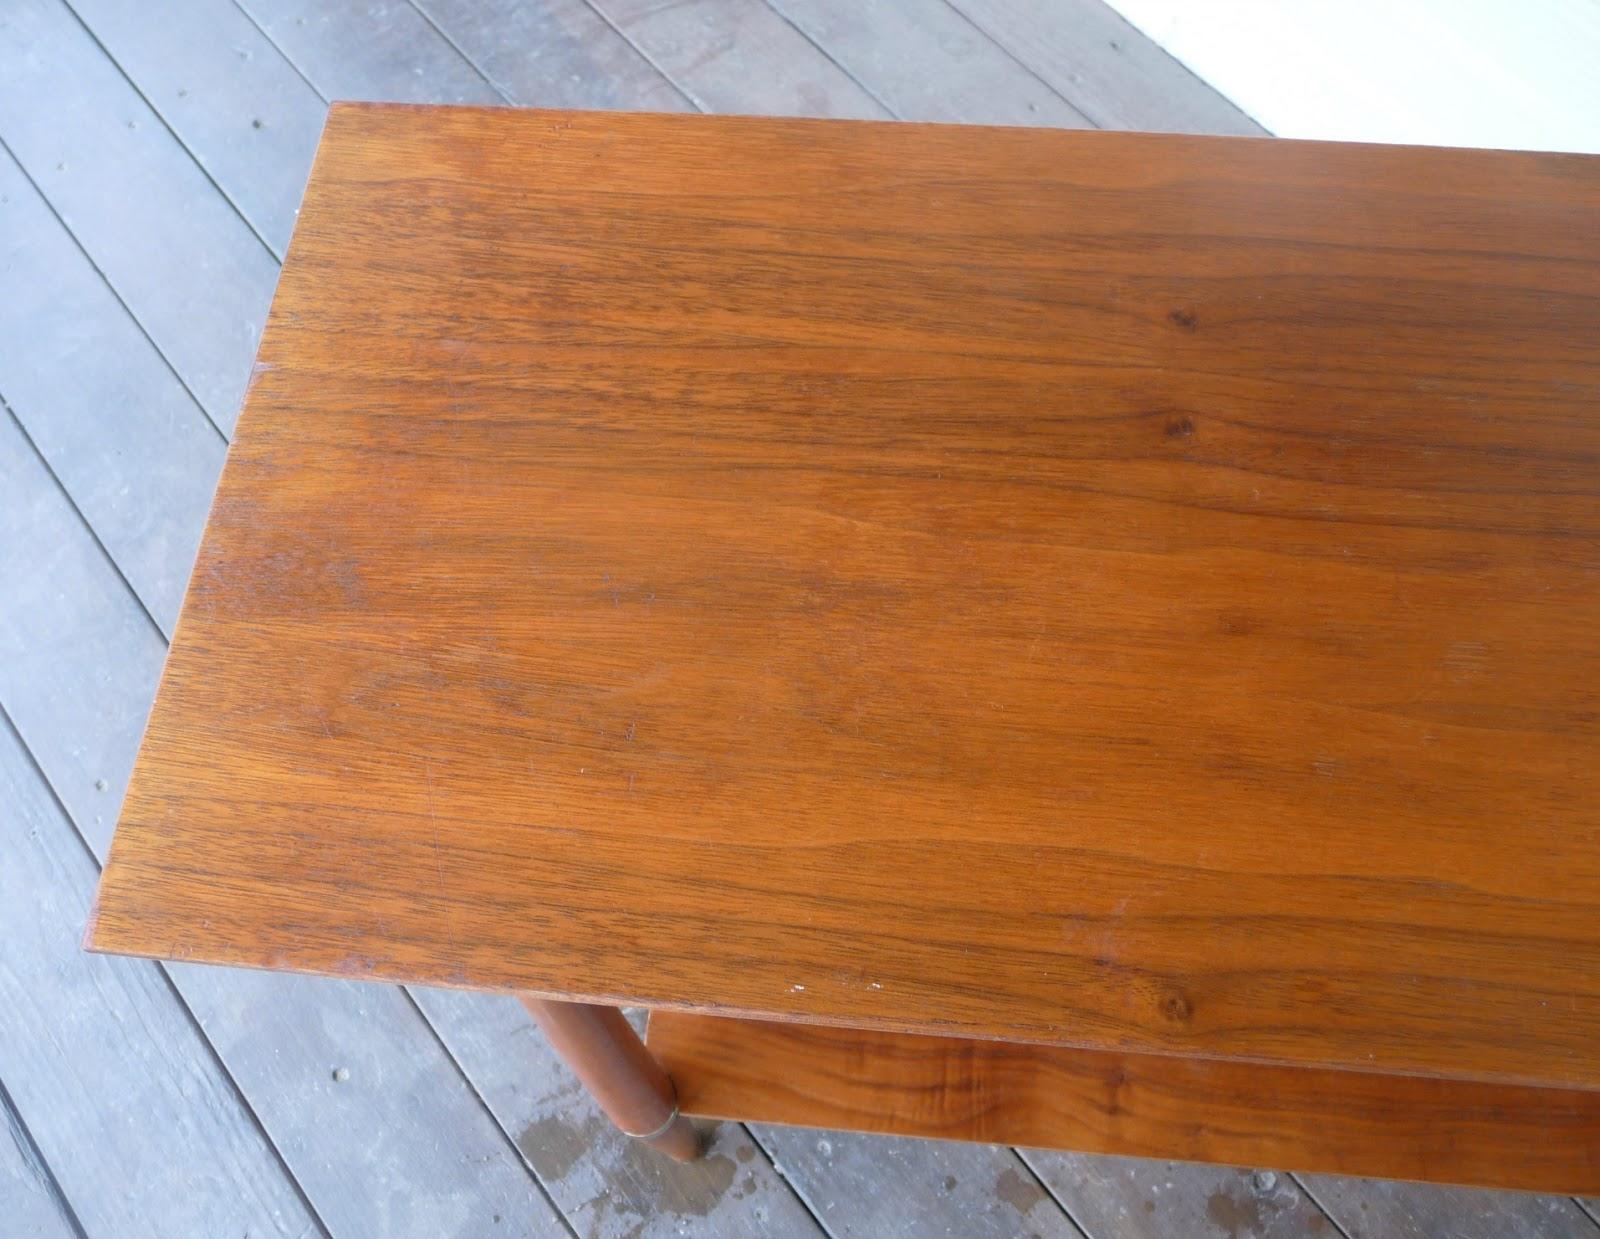 Diy Fix Scratches In Wood Furniture Popcane Page 3